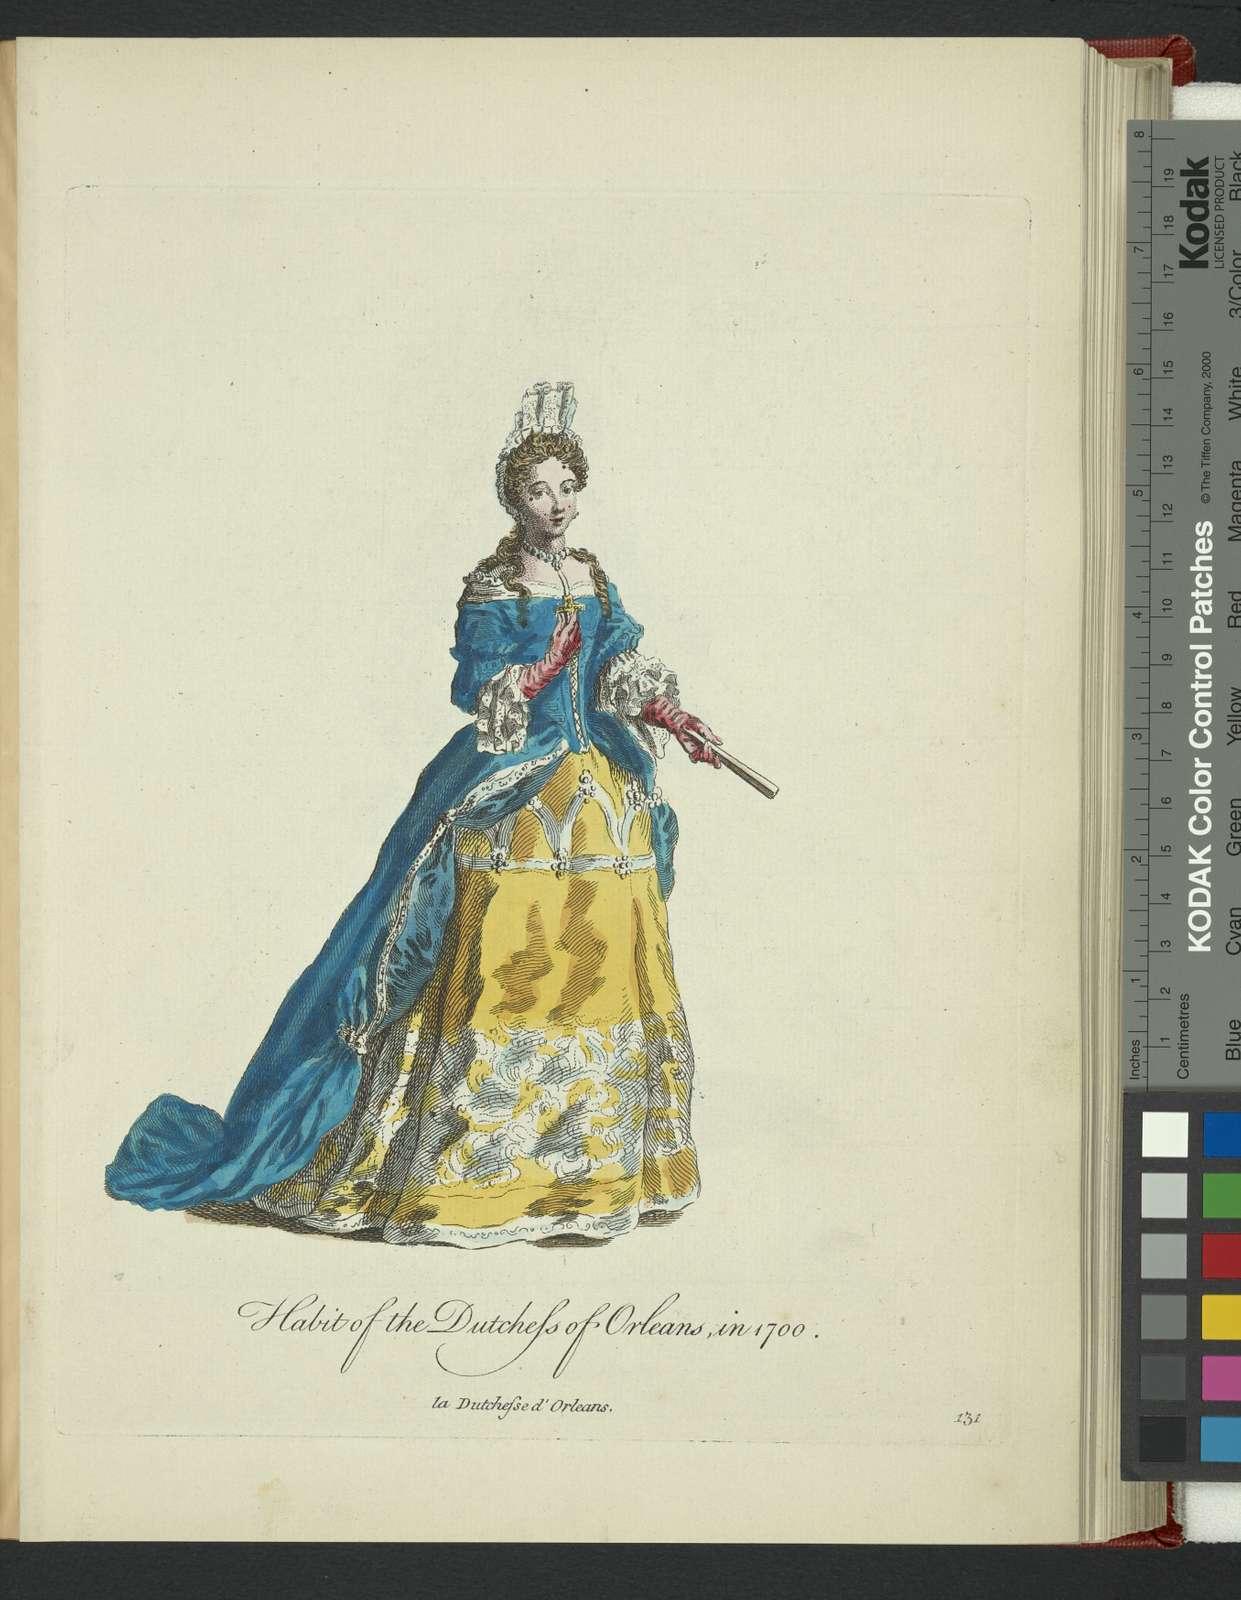 Habit of the Dutchess of Orleans in 1700. La Dutchesse d'Orleans.